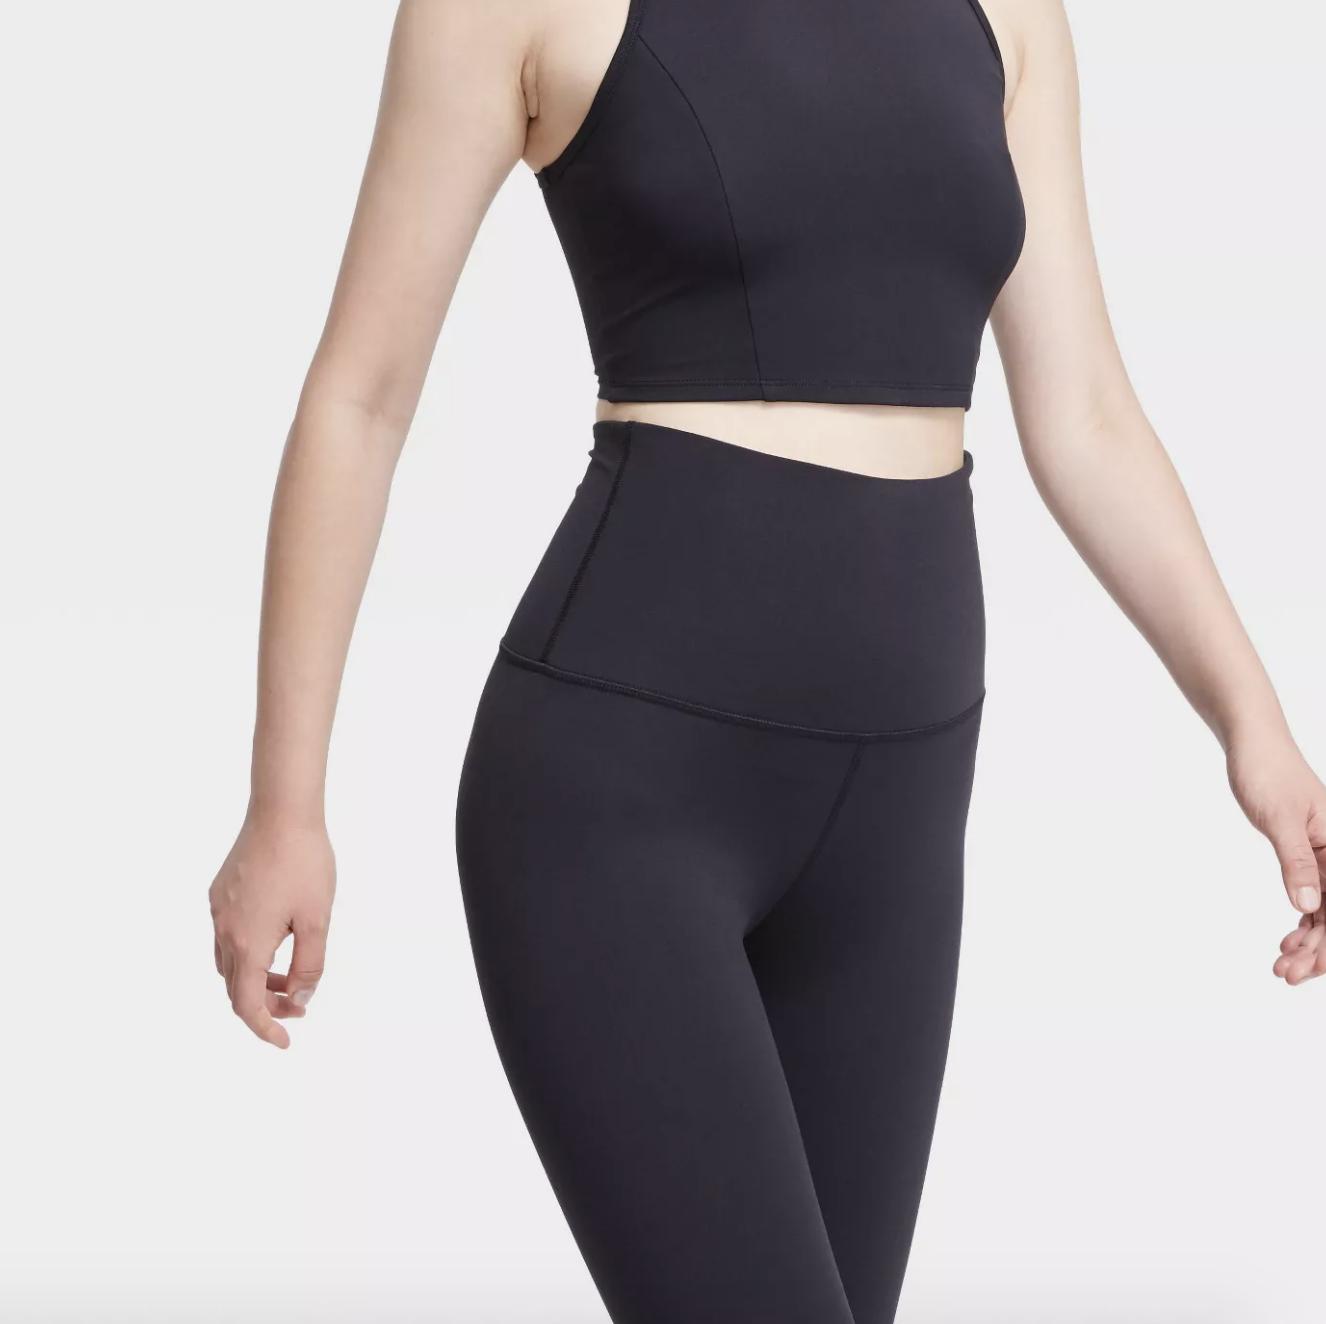 a model in the black leggings